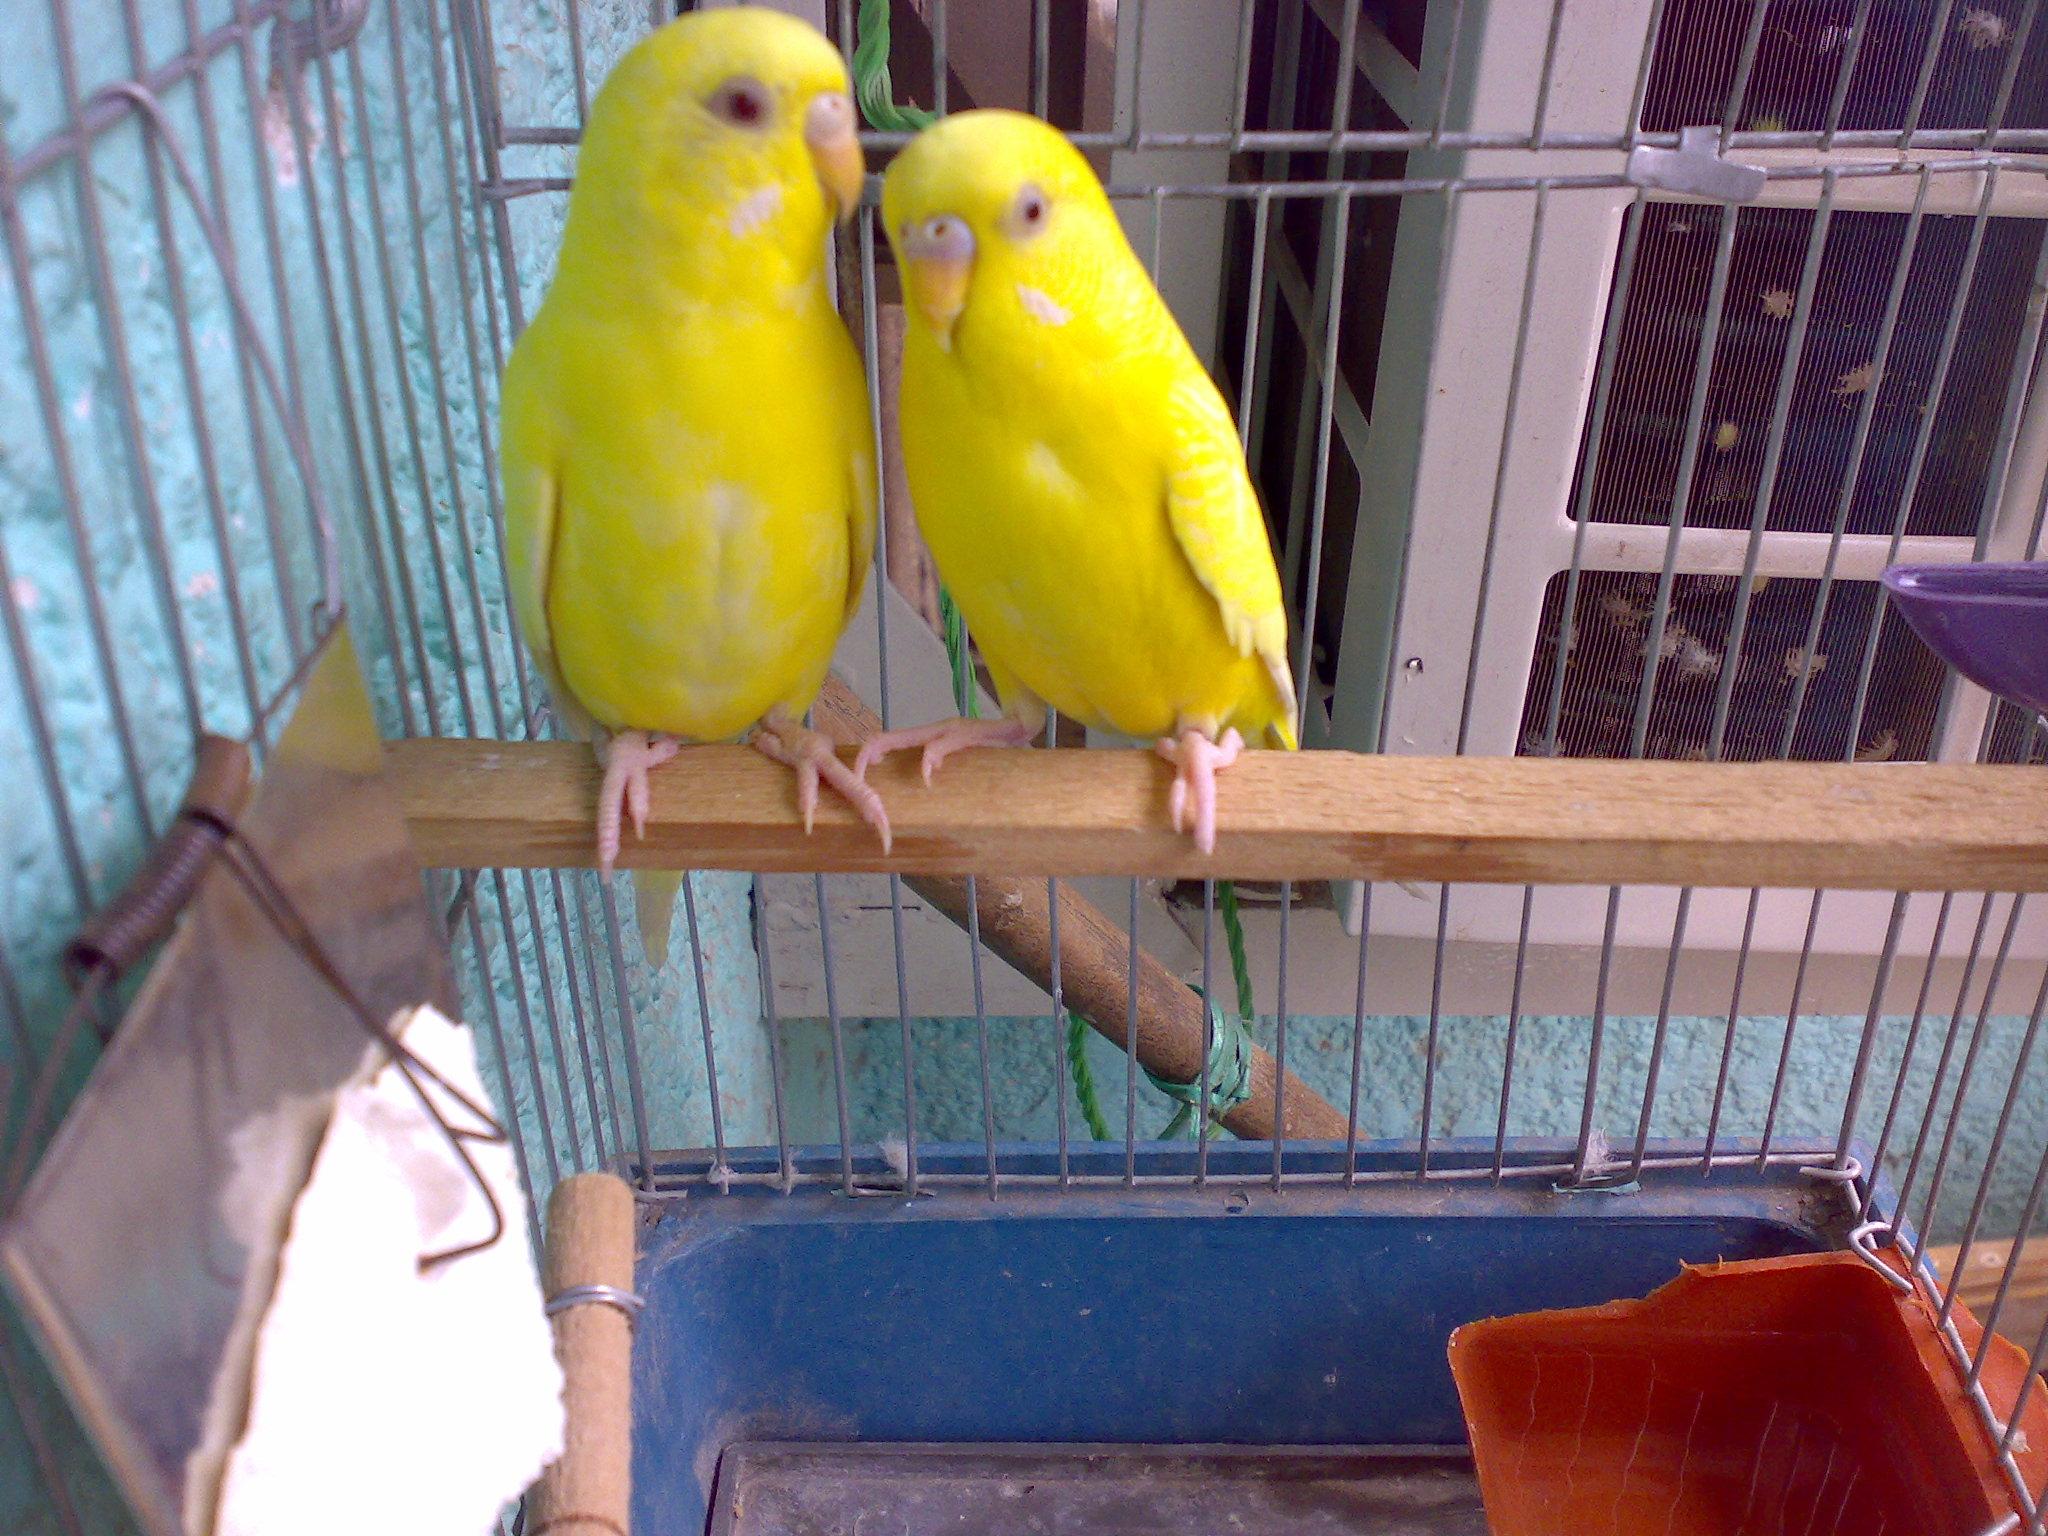 74a49f577d64d الطَّائِر – Bird  الطيور مدونة سليم بن عاقل